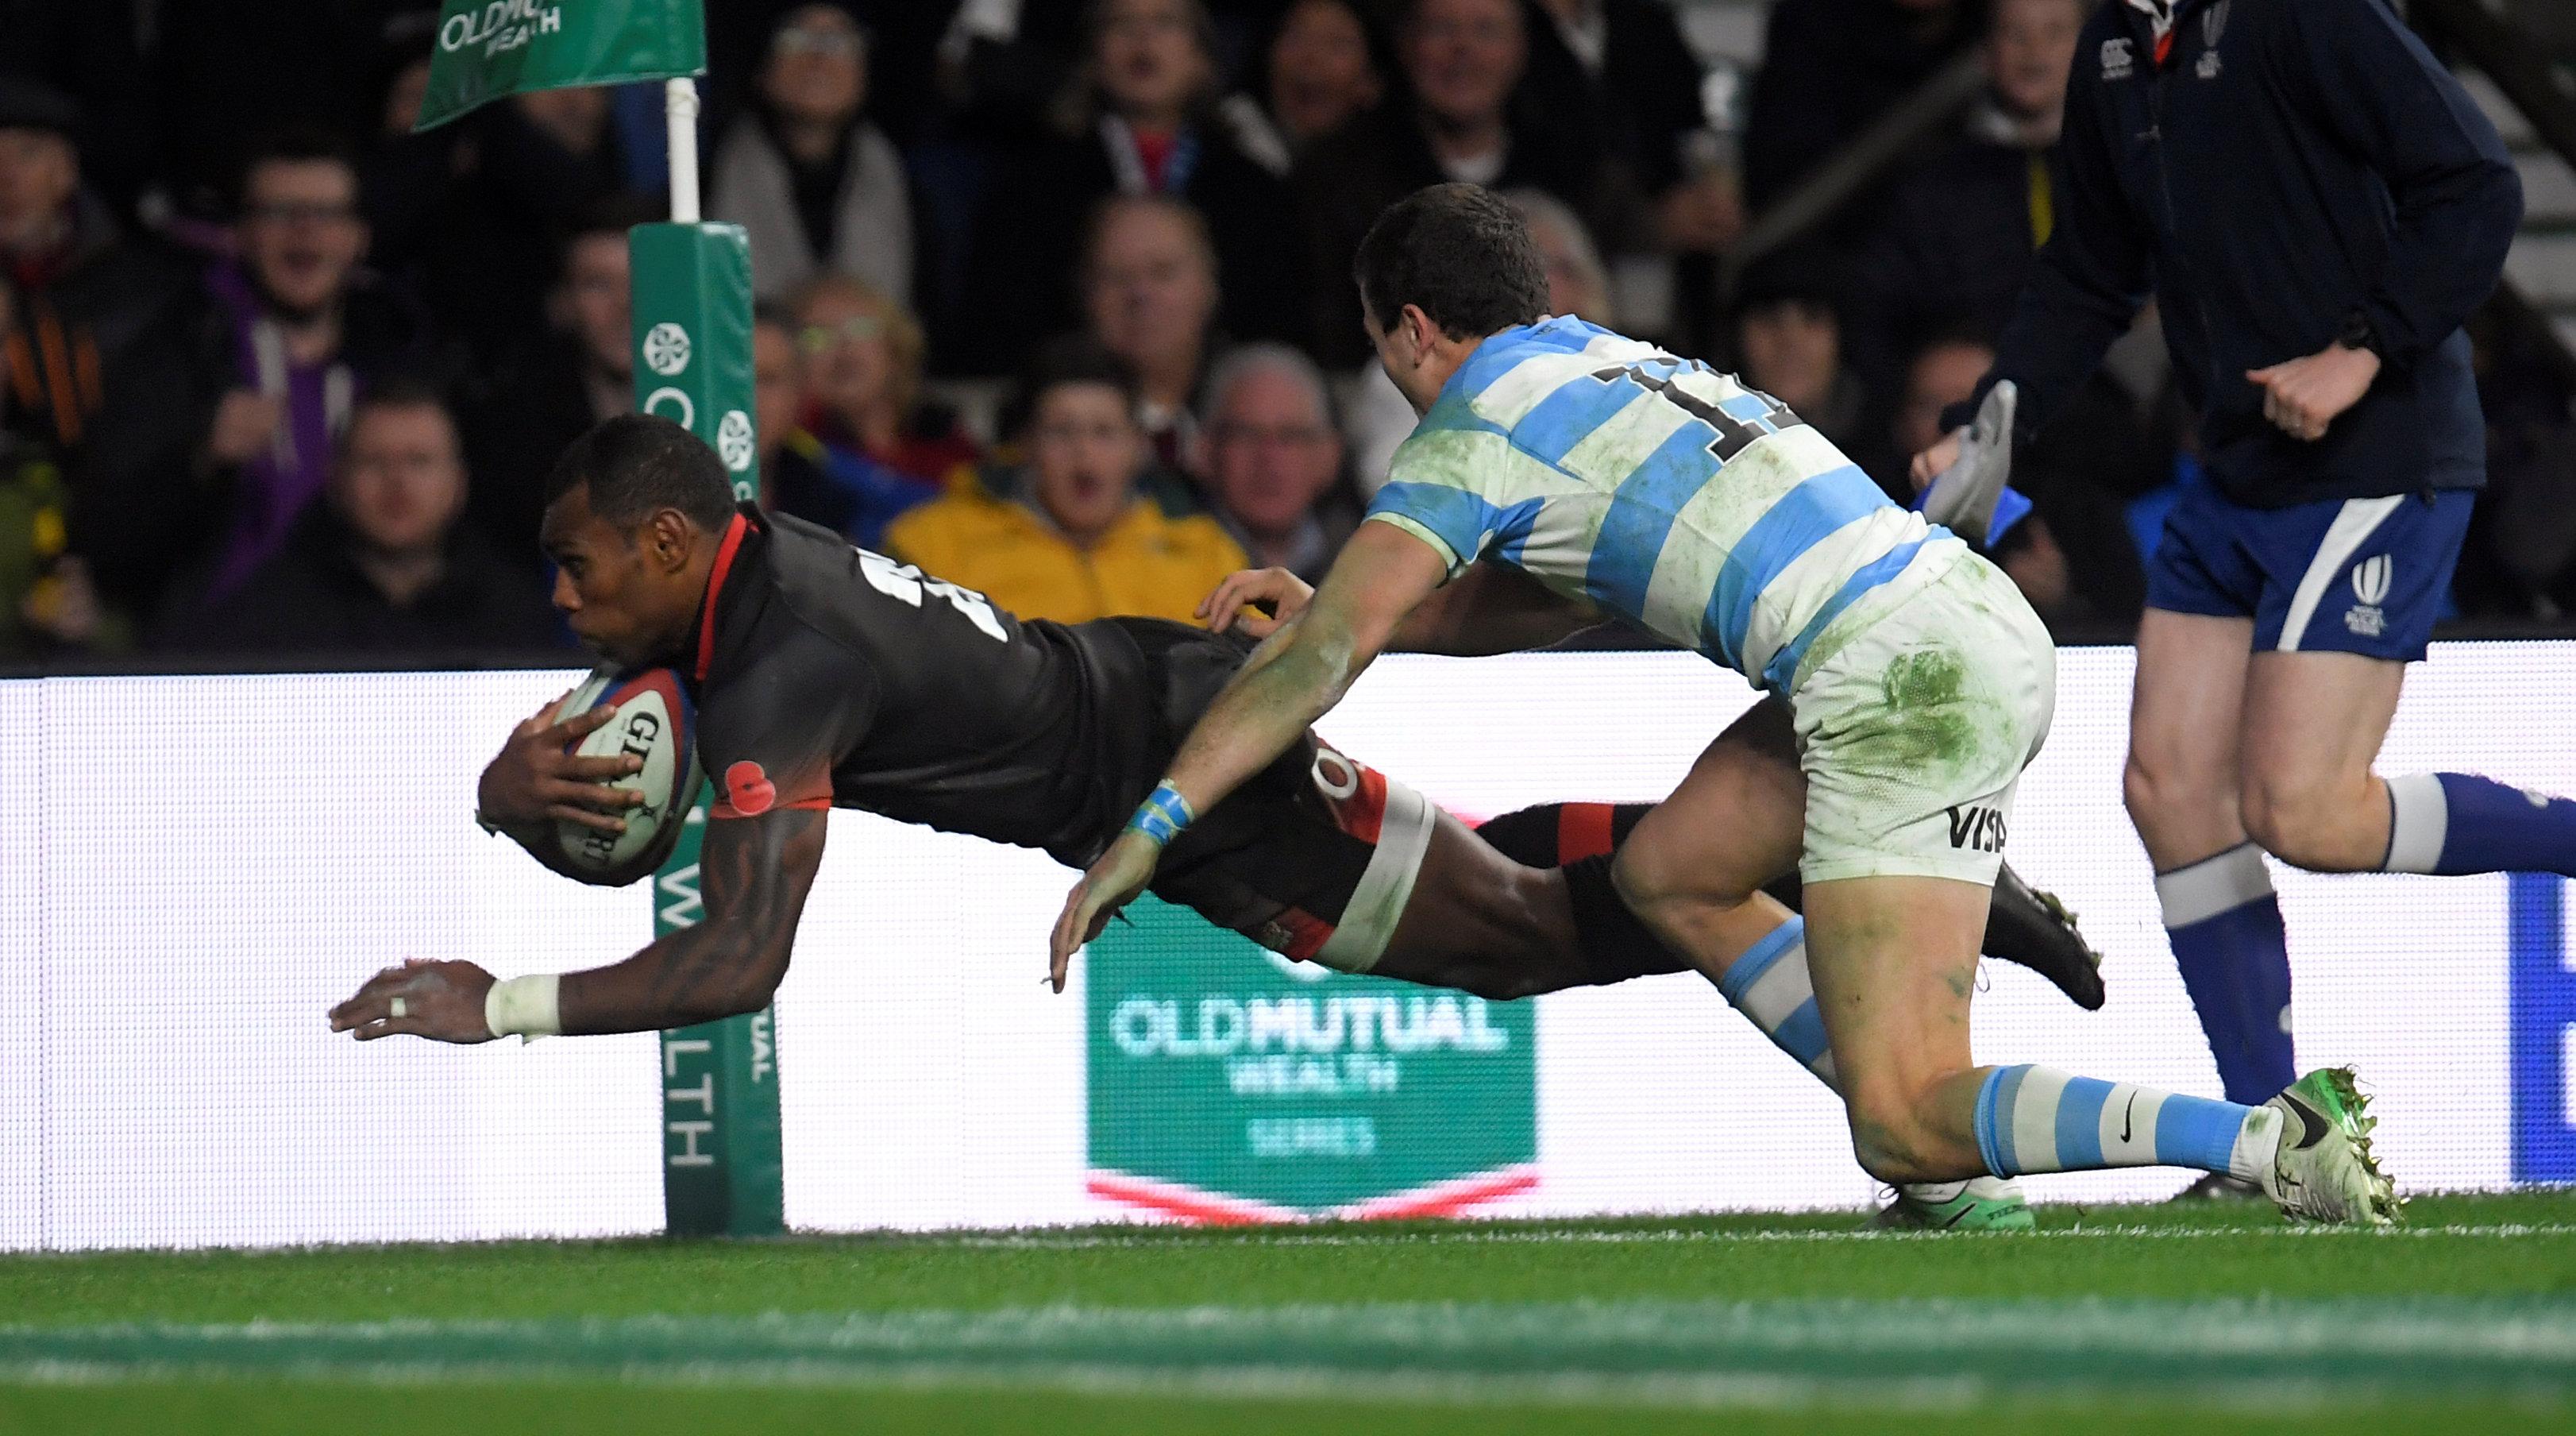 Rugby: Stuttering England beat Argentina at Twickenham